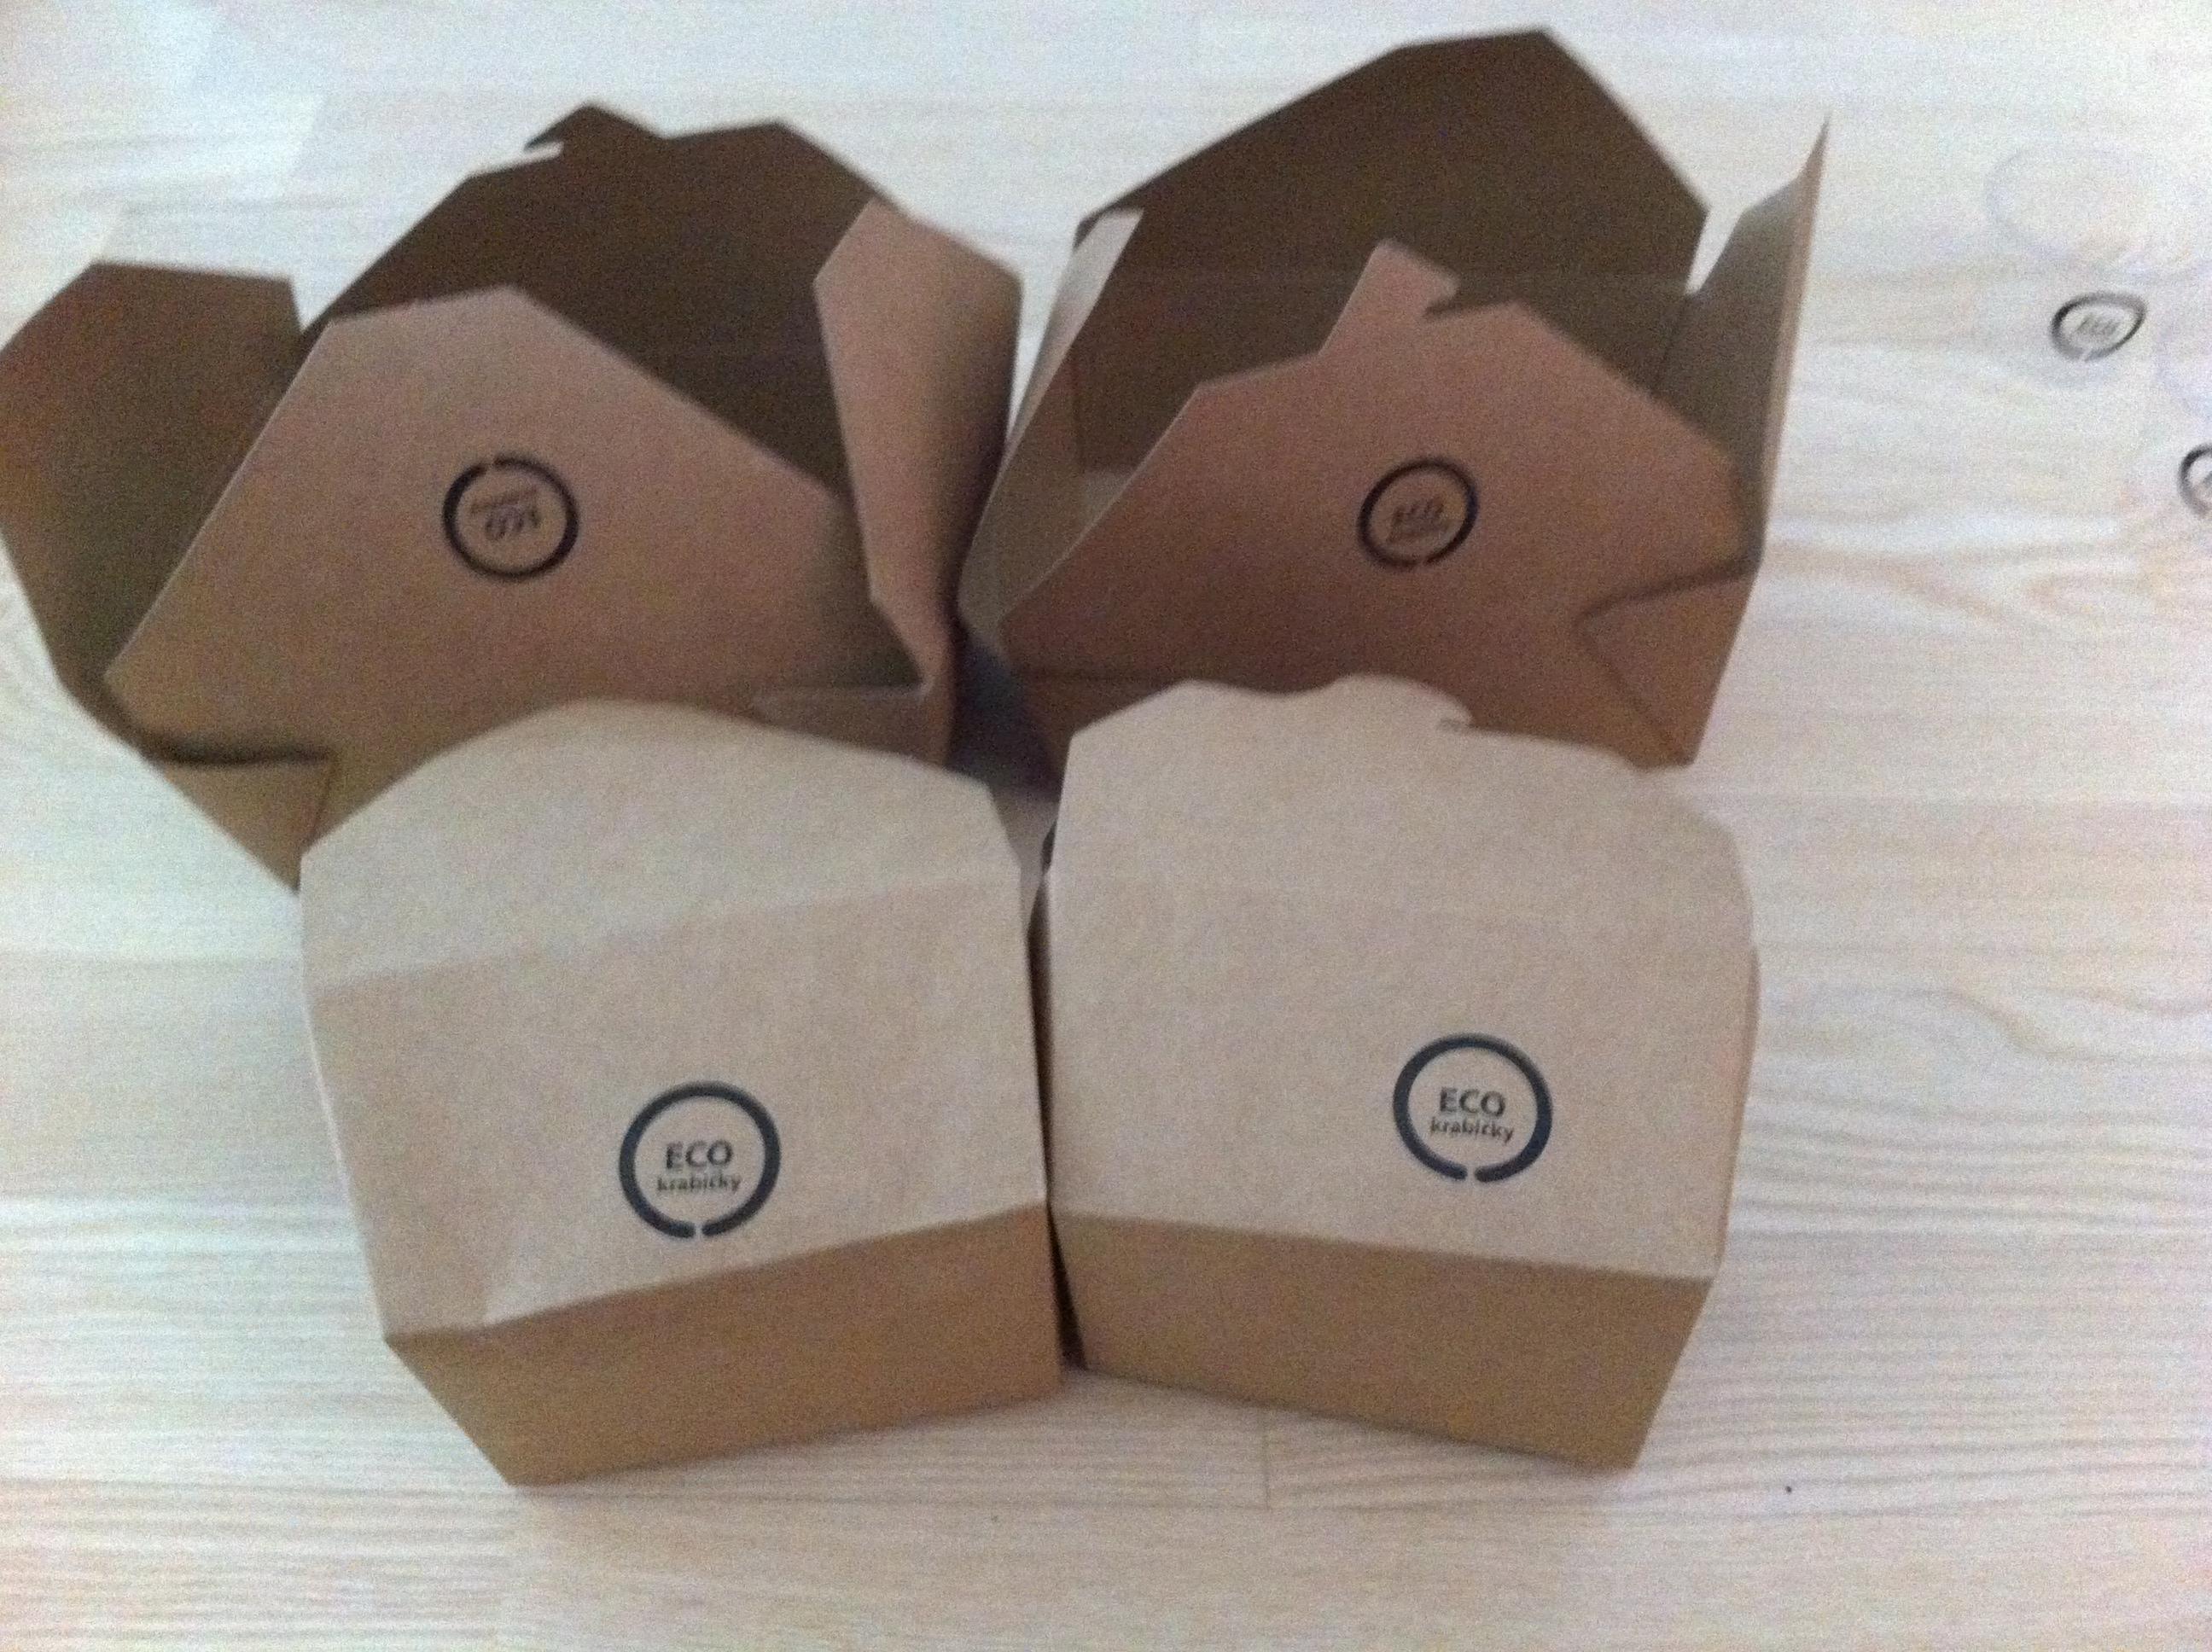 ECO krabicky